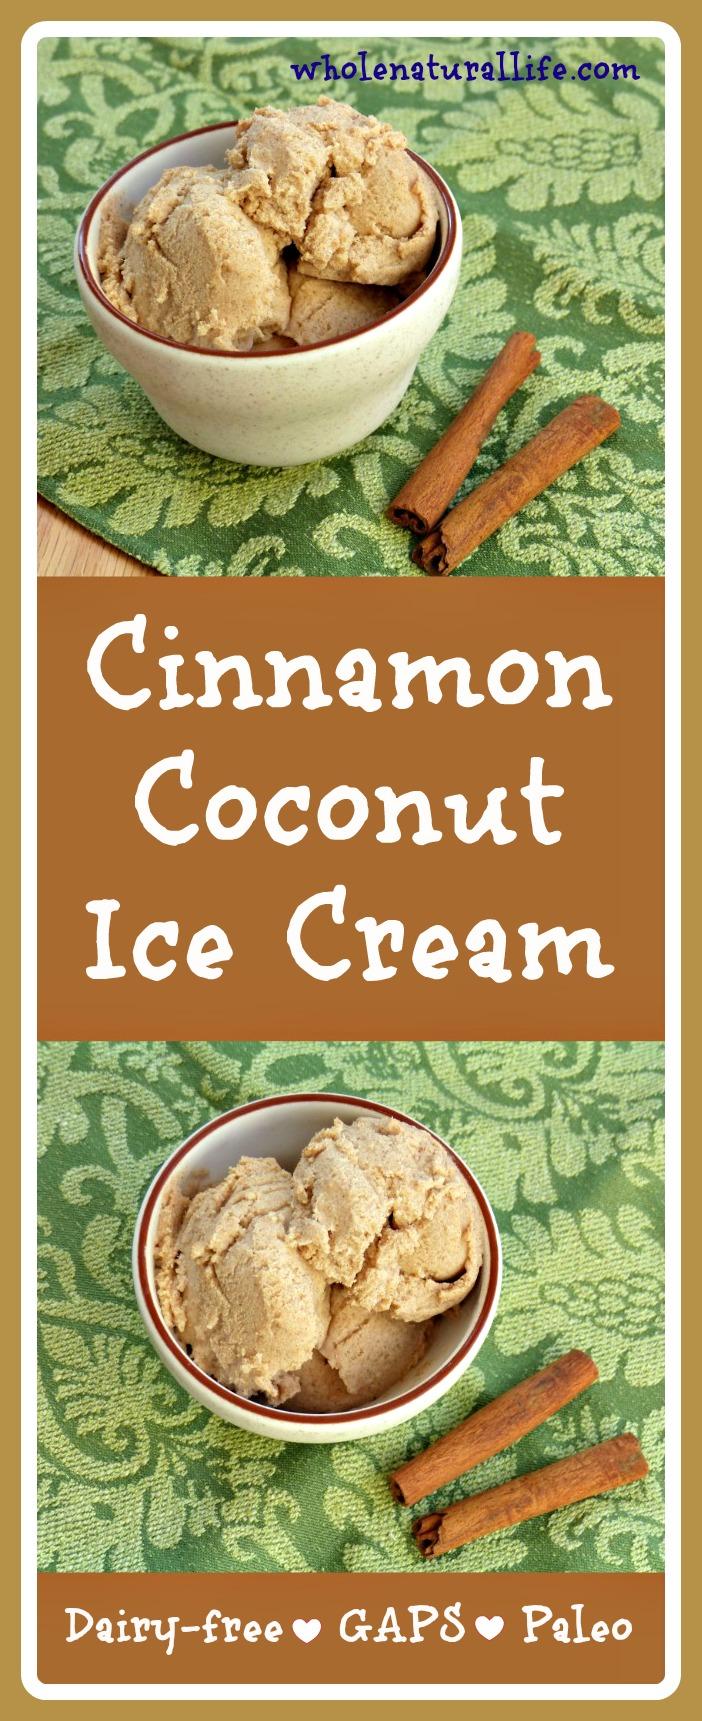 Cinnamon Coconut Ice Cream